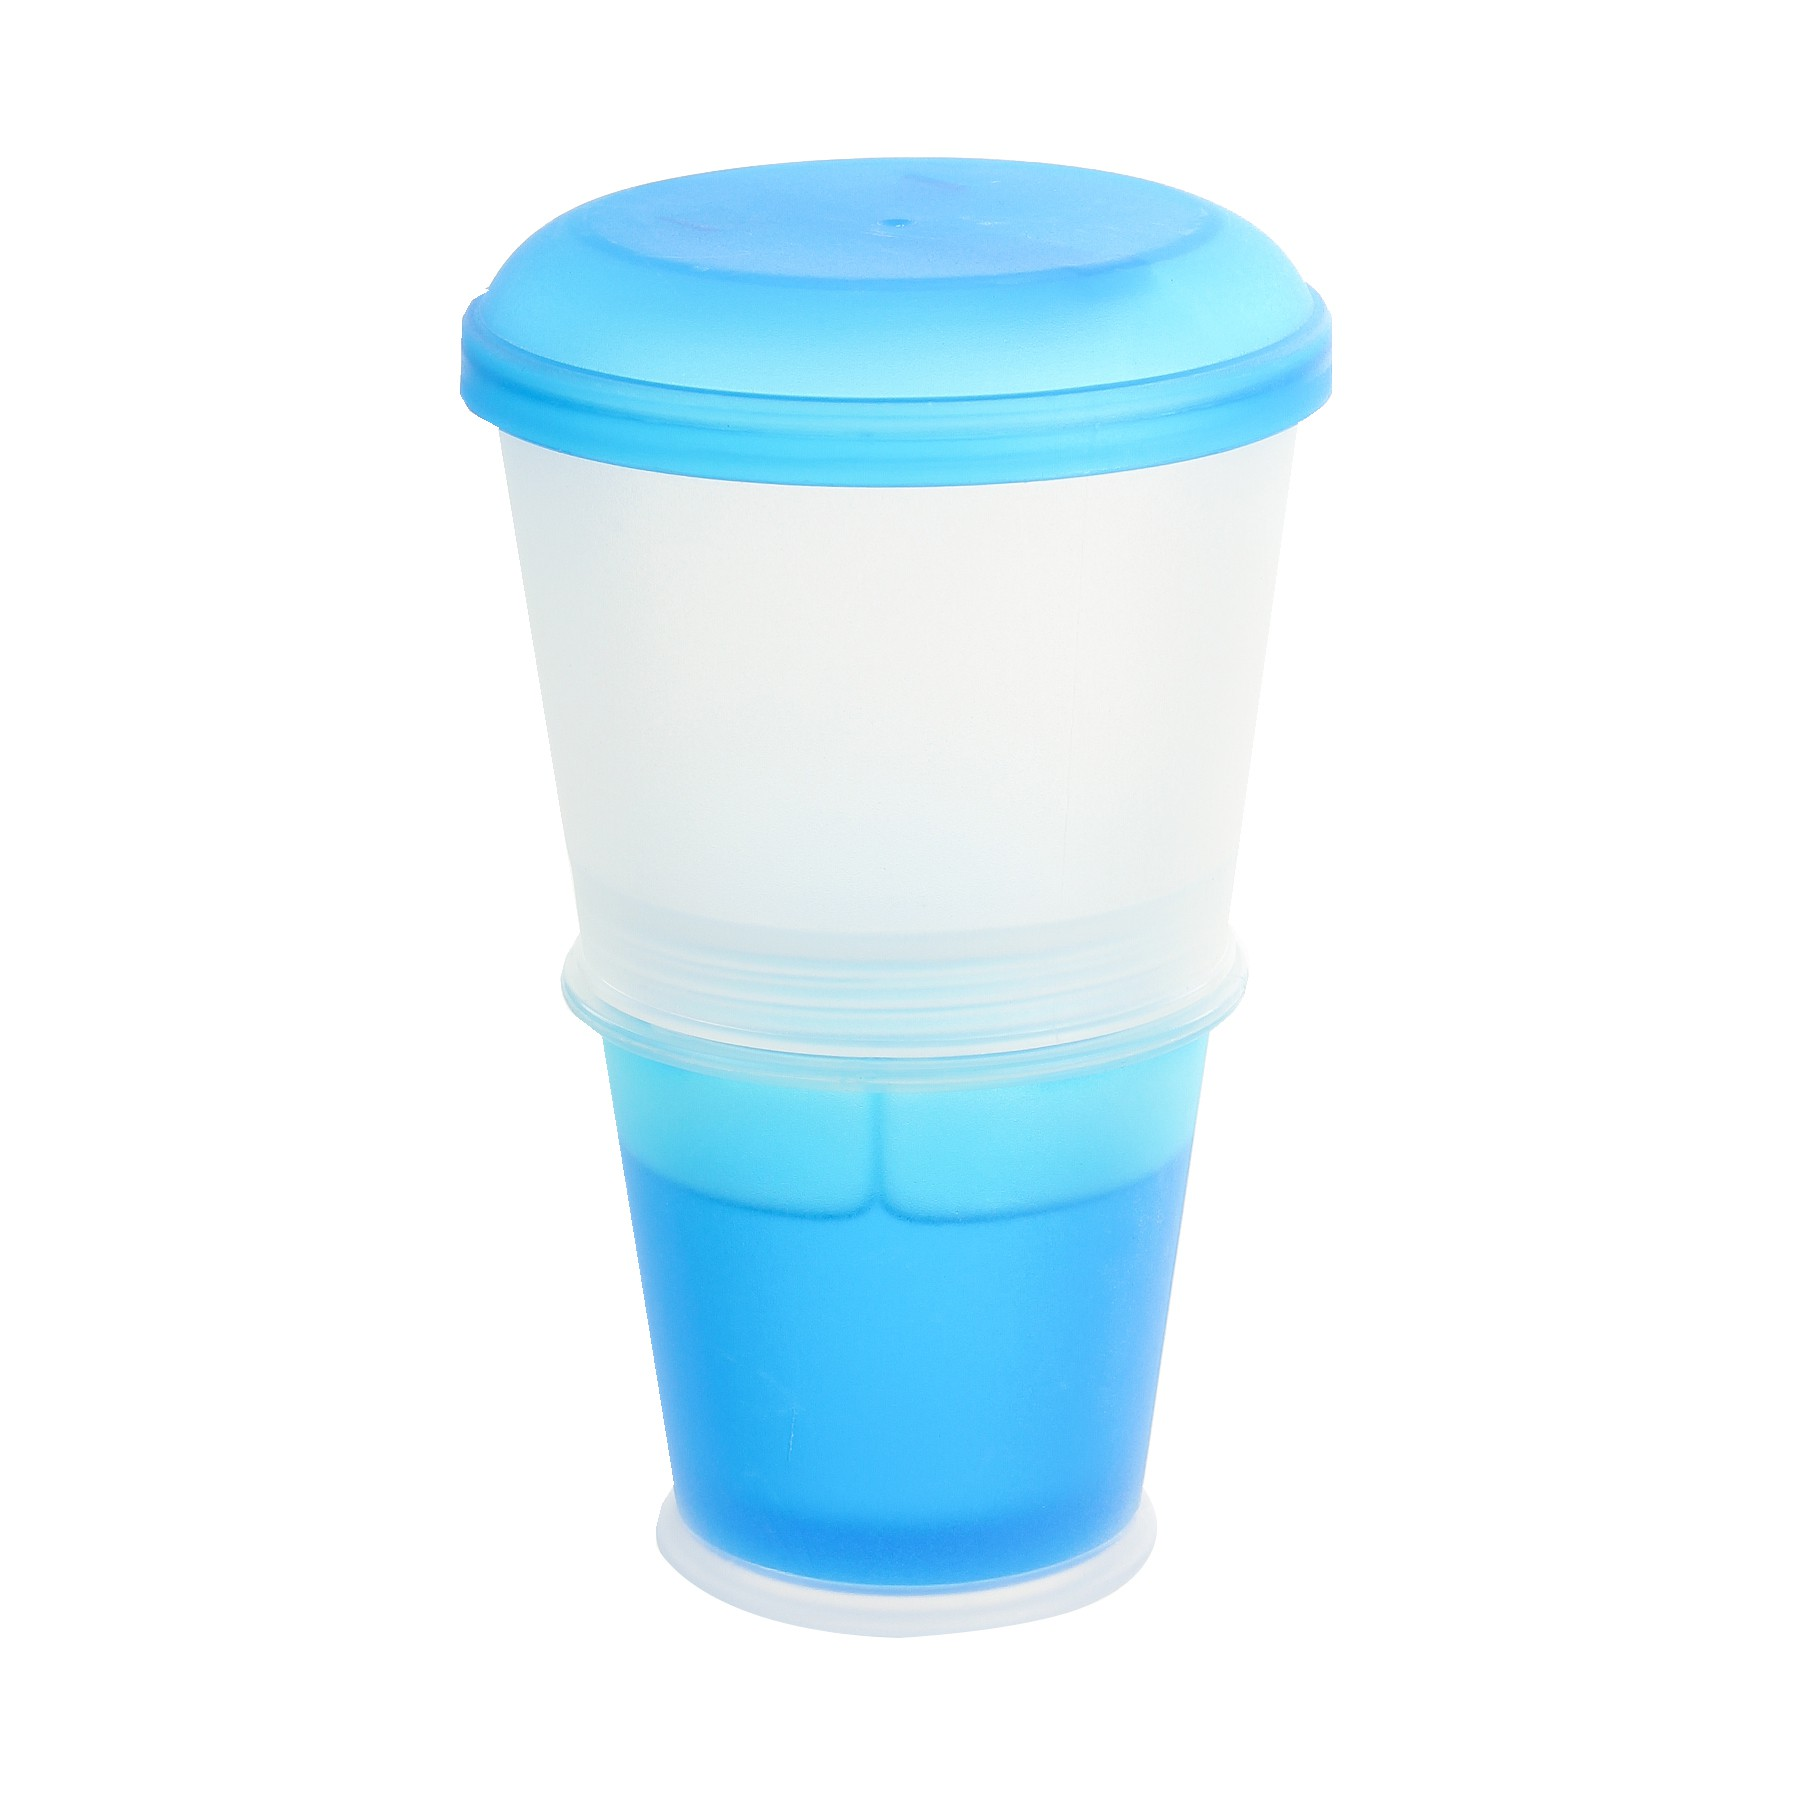 Behälter für Joghurt und Müsli, 330 ml Bild https://cdn03.plentymarkets.com/zsy4vjx32p87/item/images/5053/full/13083-ama-01.JPG